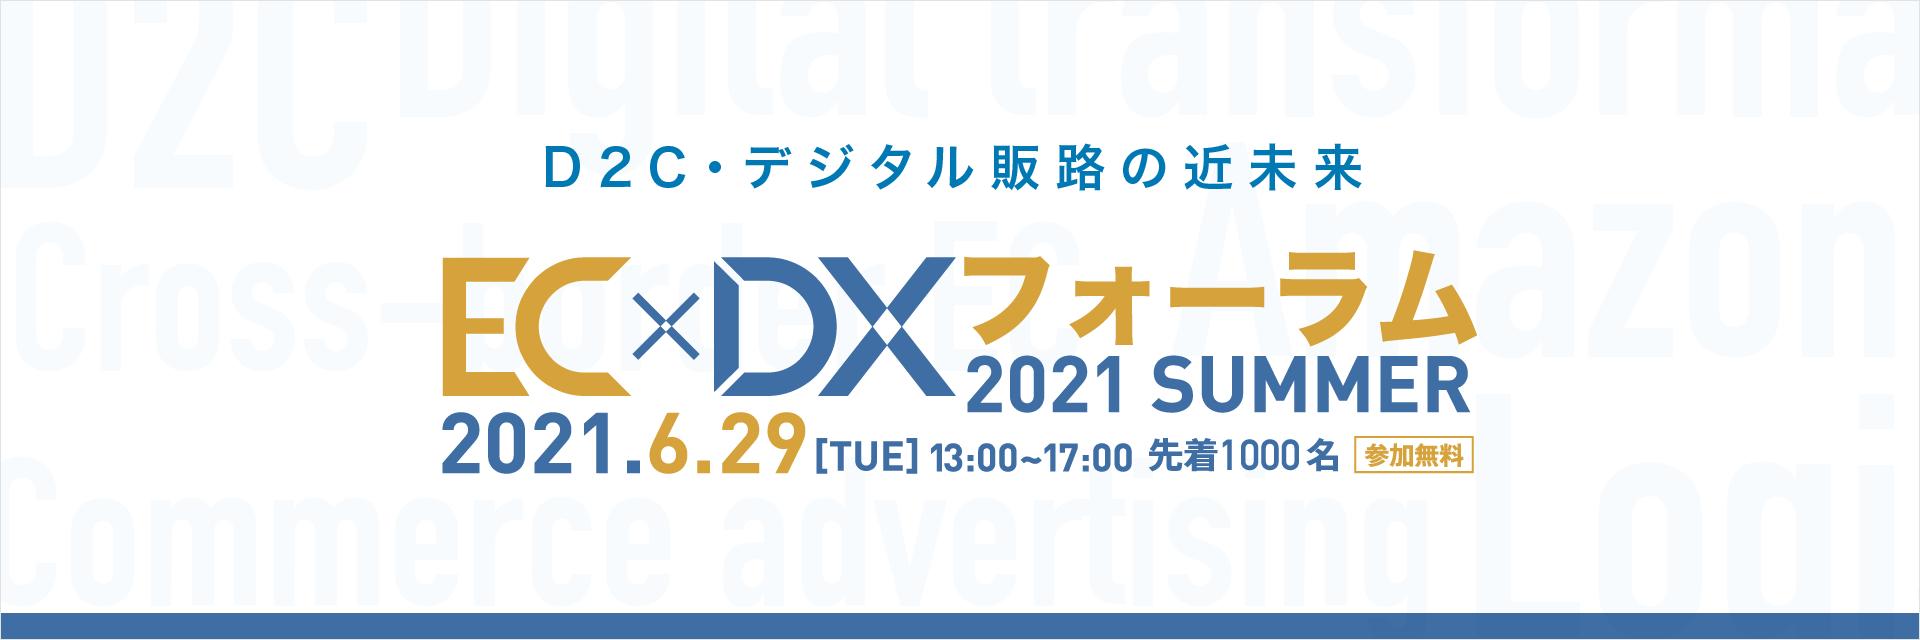 EC×DXフォーラム_2021_SUMMER